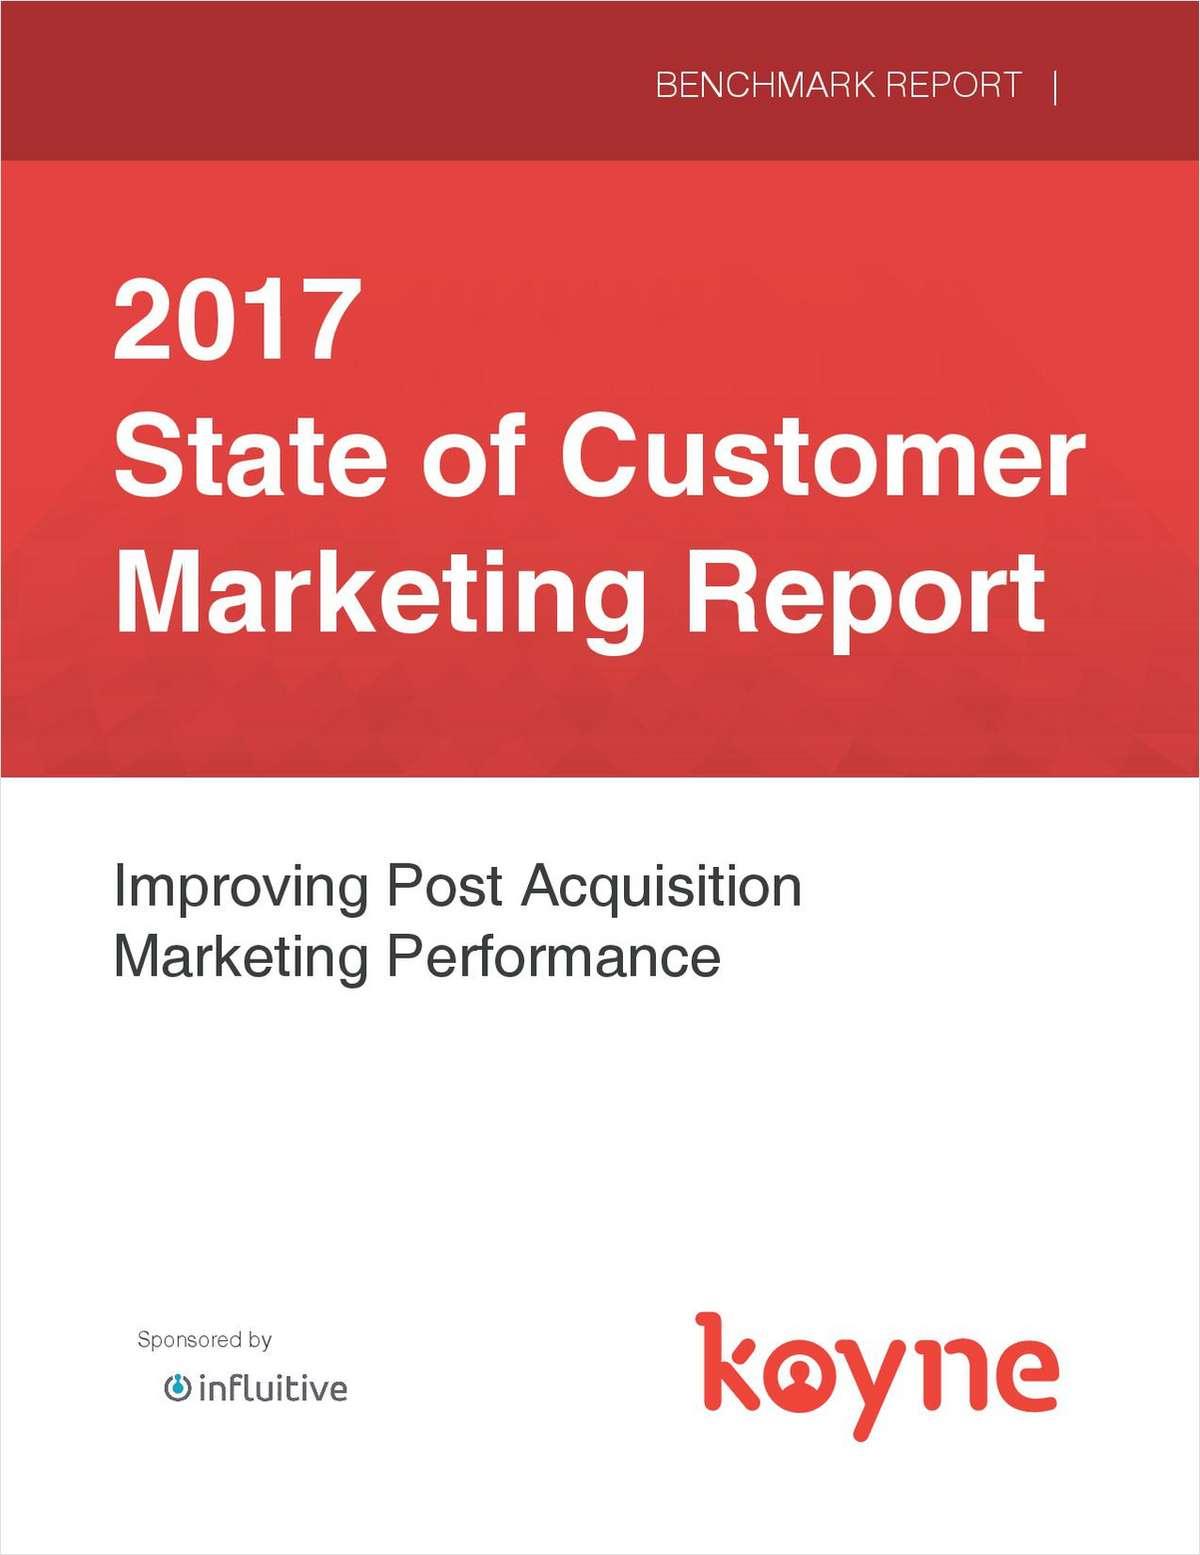 2017 State of Customer Marketing Report